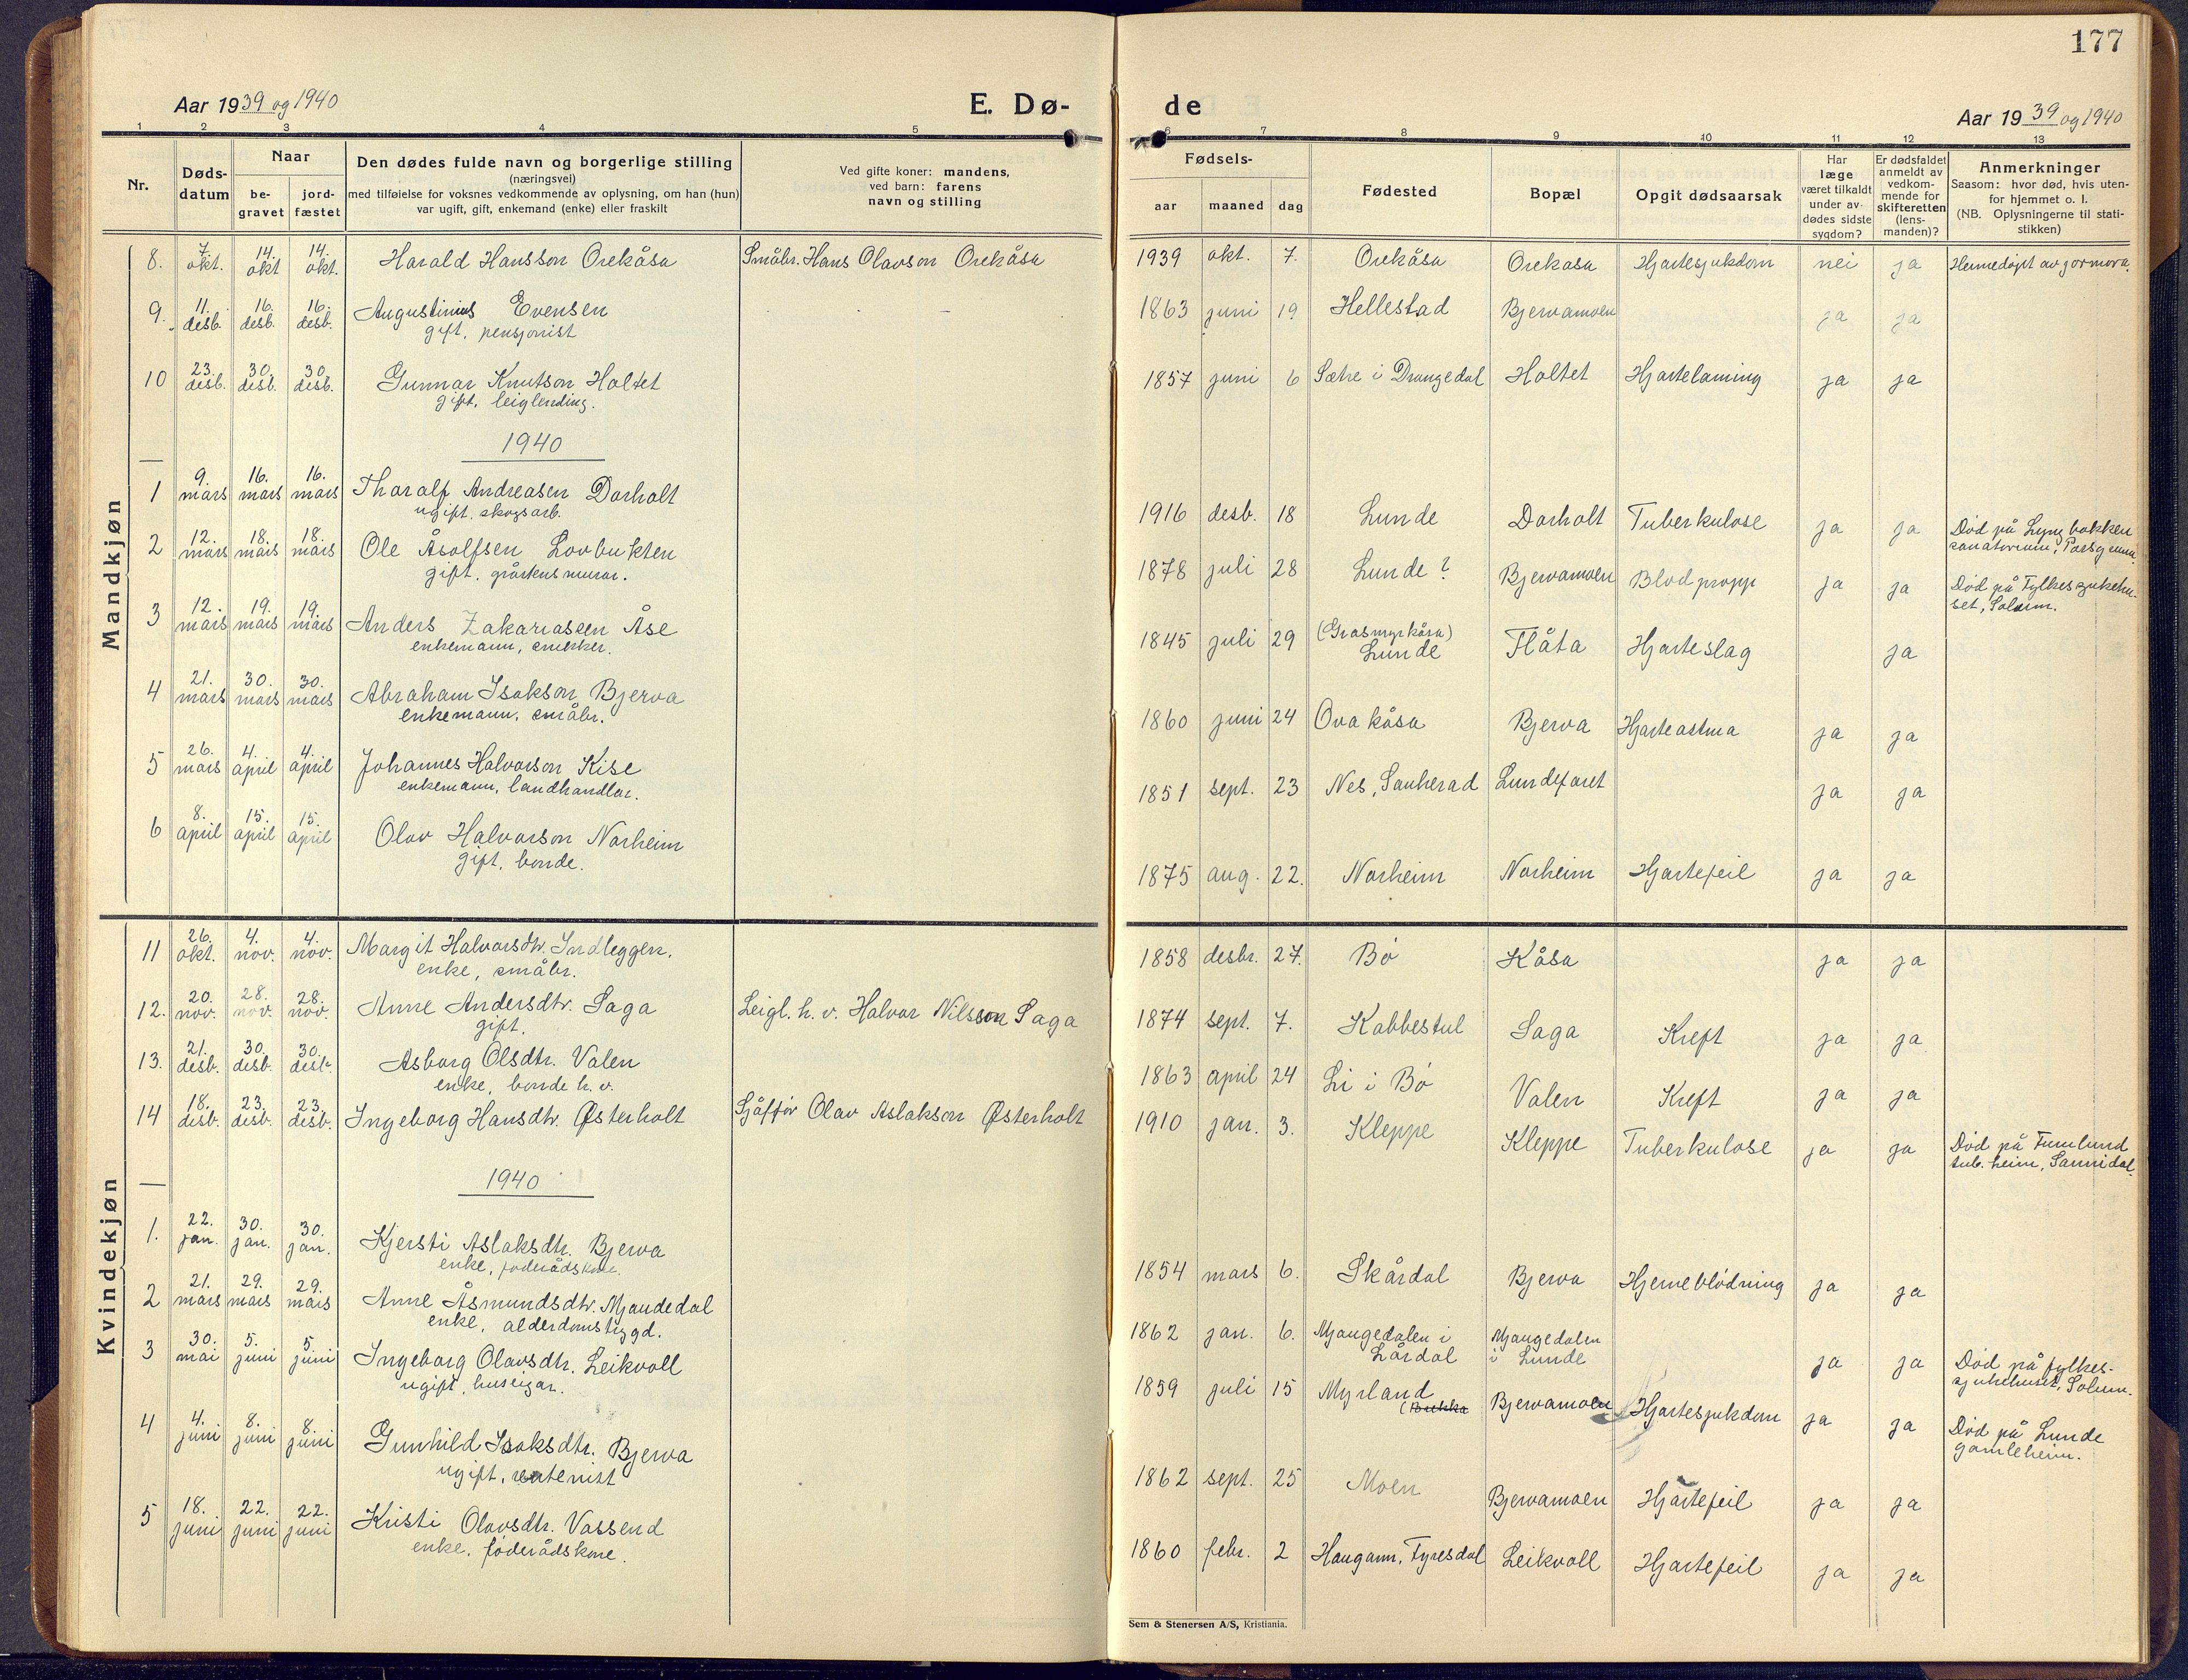 SAKO, Lunde kirkebøker, F/Fa/L0006: Ministerialbok nr. I 6, 1922-1940, s. 177